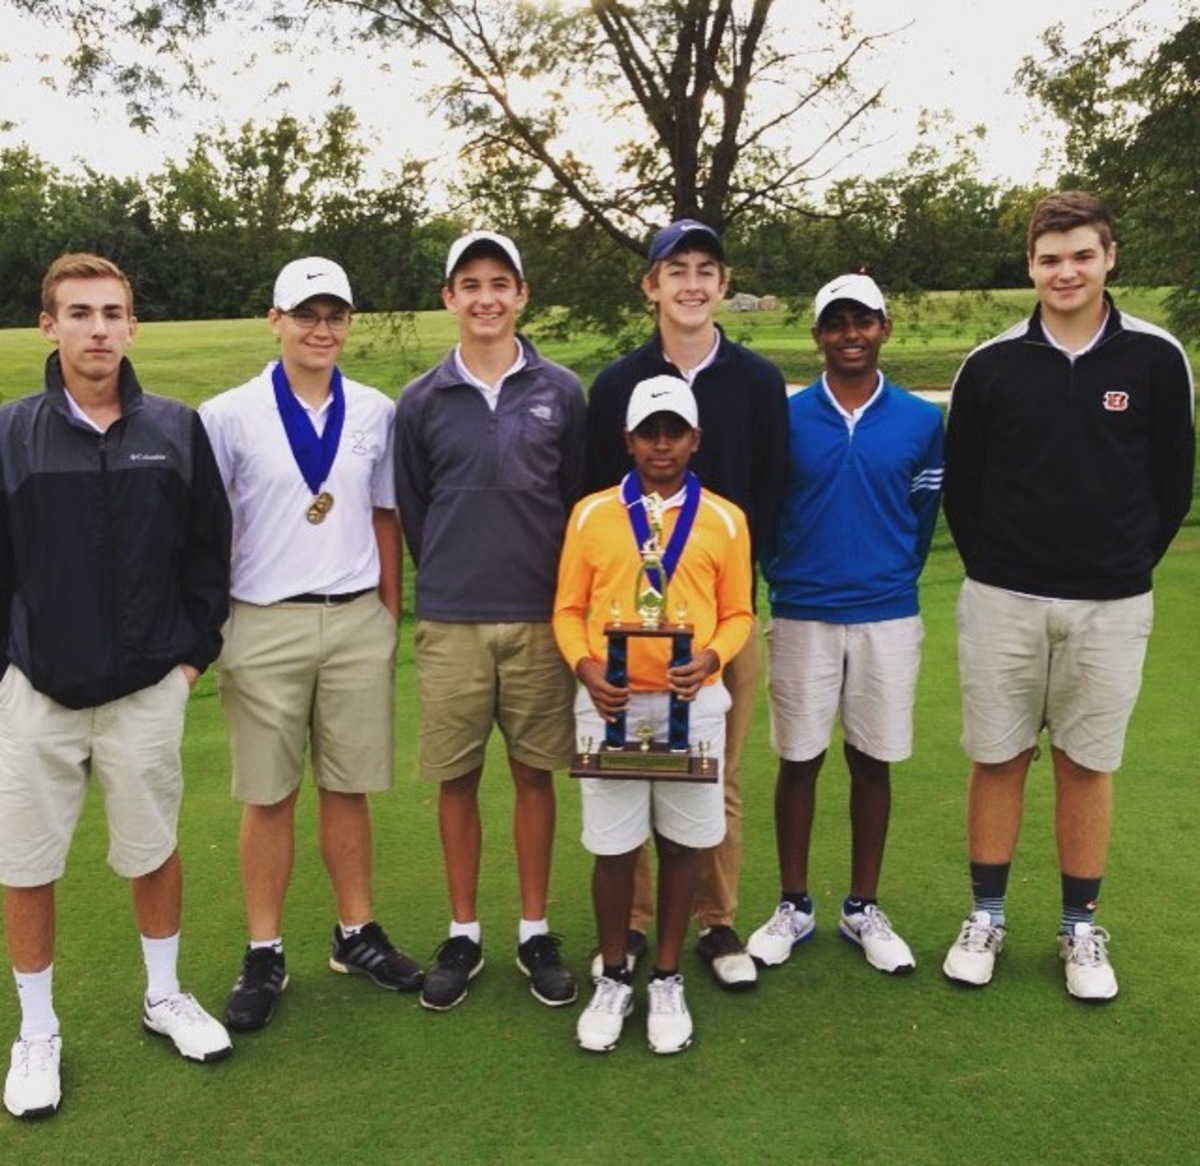 Boys' Golf Team Looks Ahead to MVC Tournament and Beyond